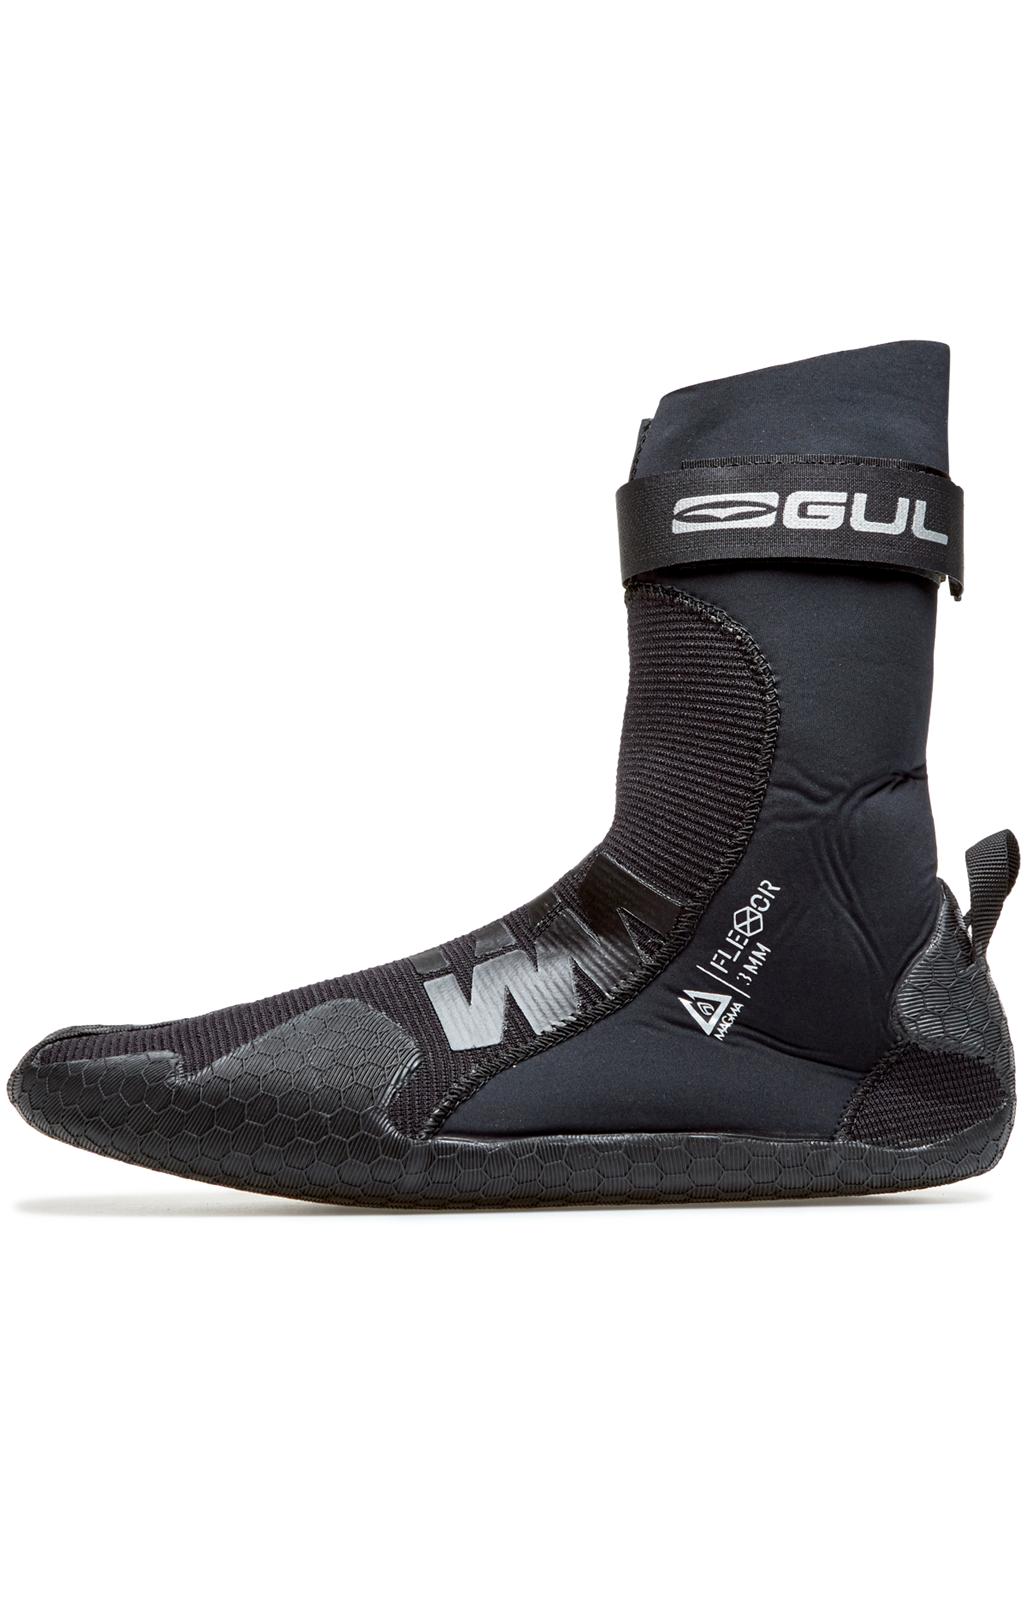 Neoprénové boty 3mm '20 GUL Flexor Split Toe BO1299 - 9